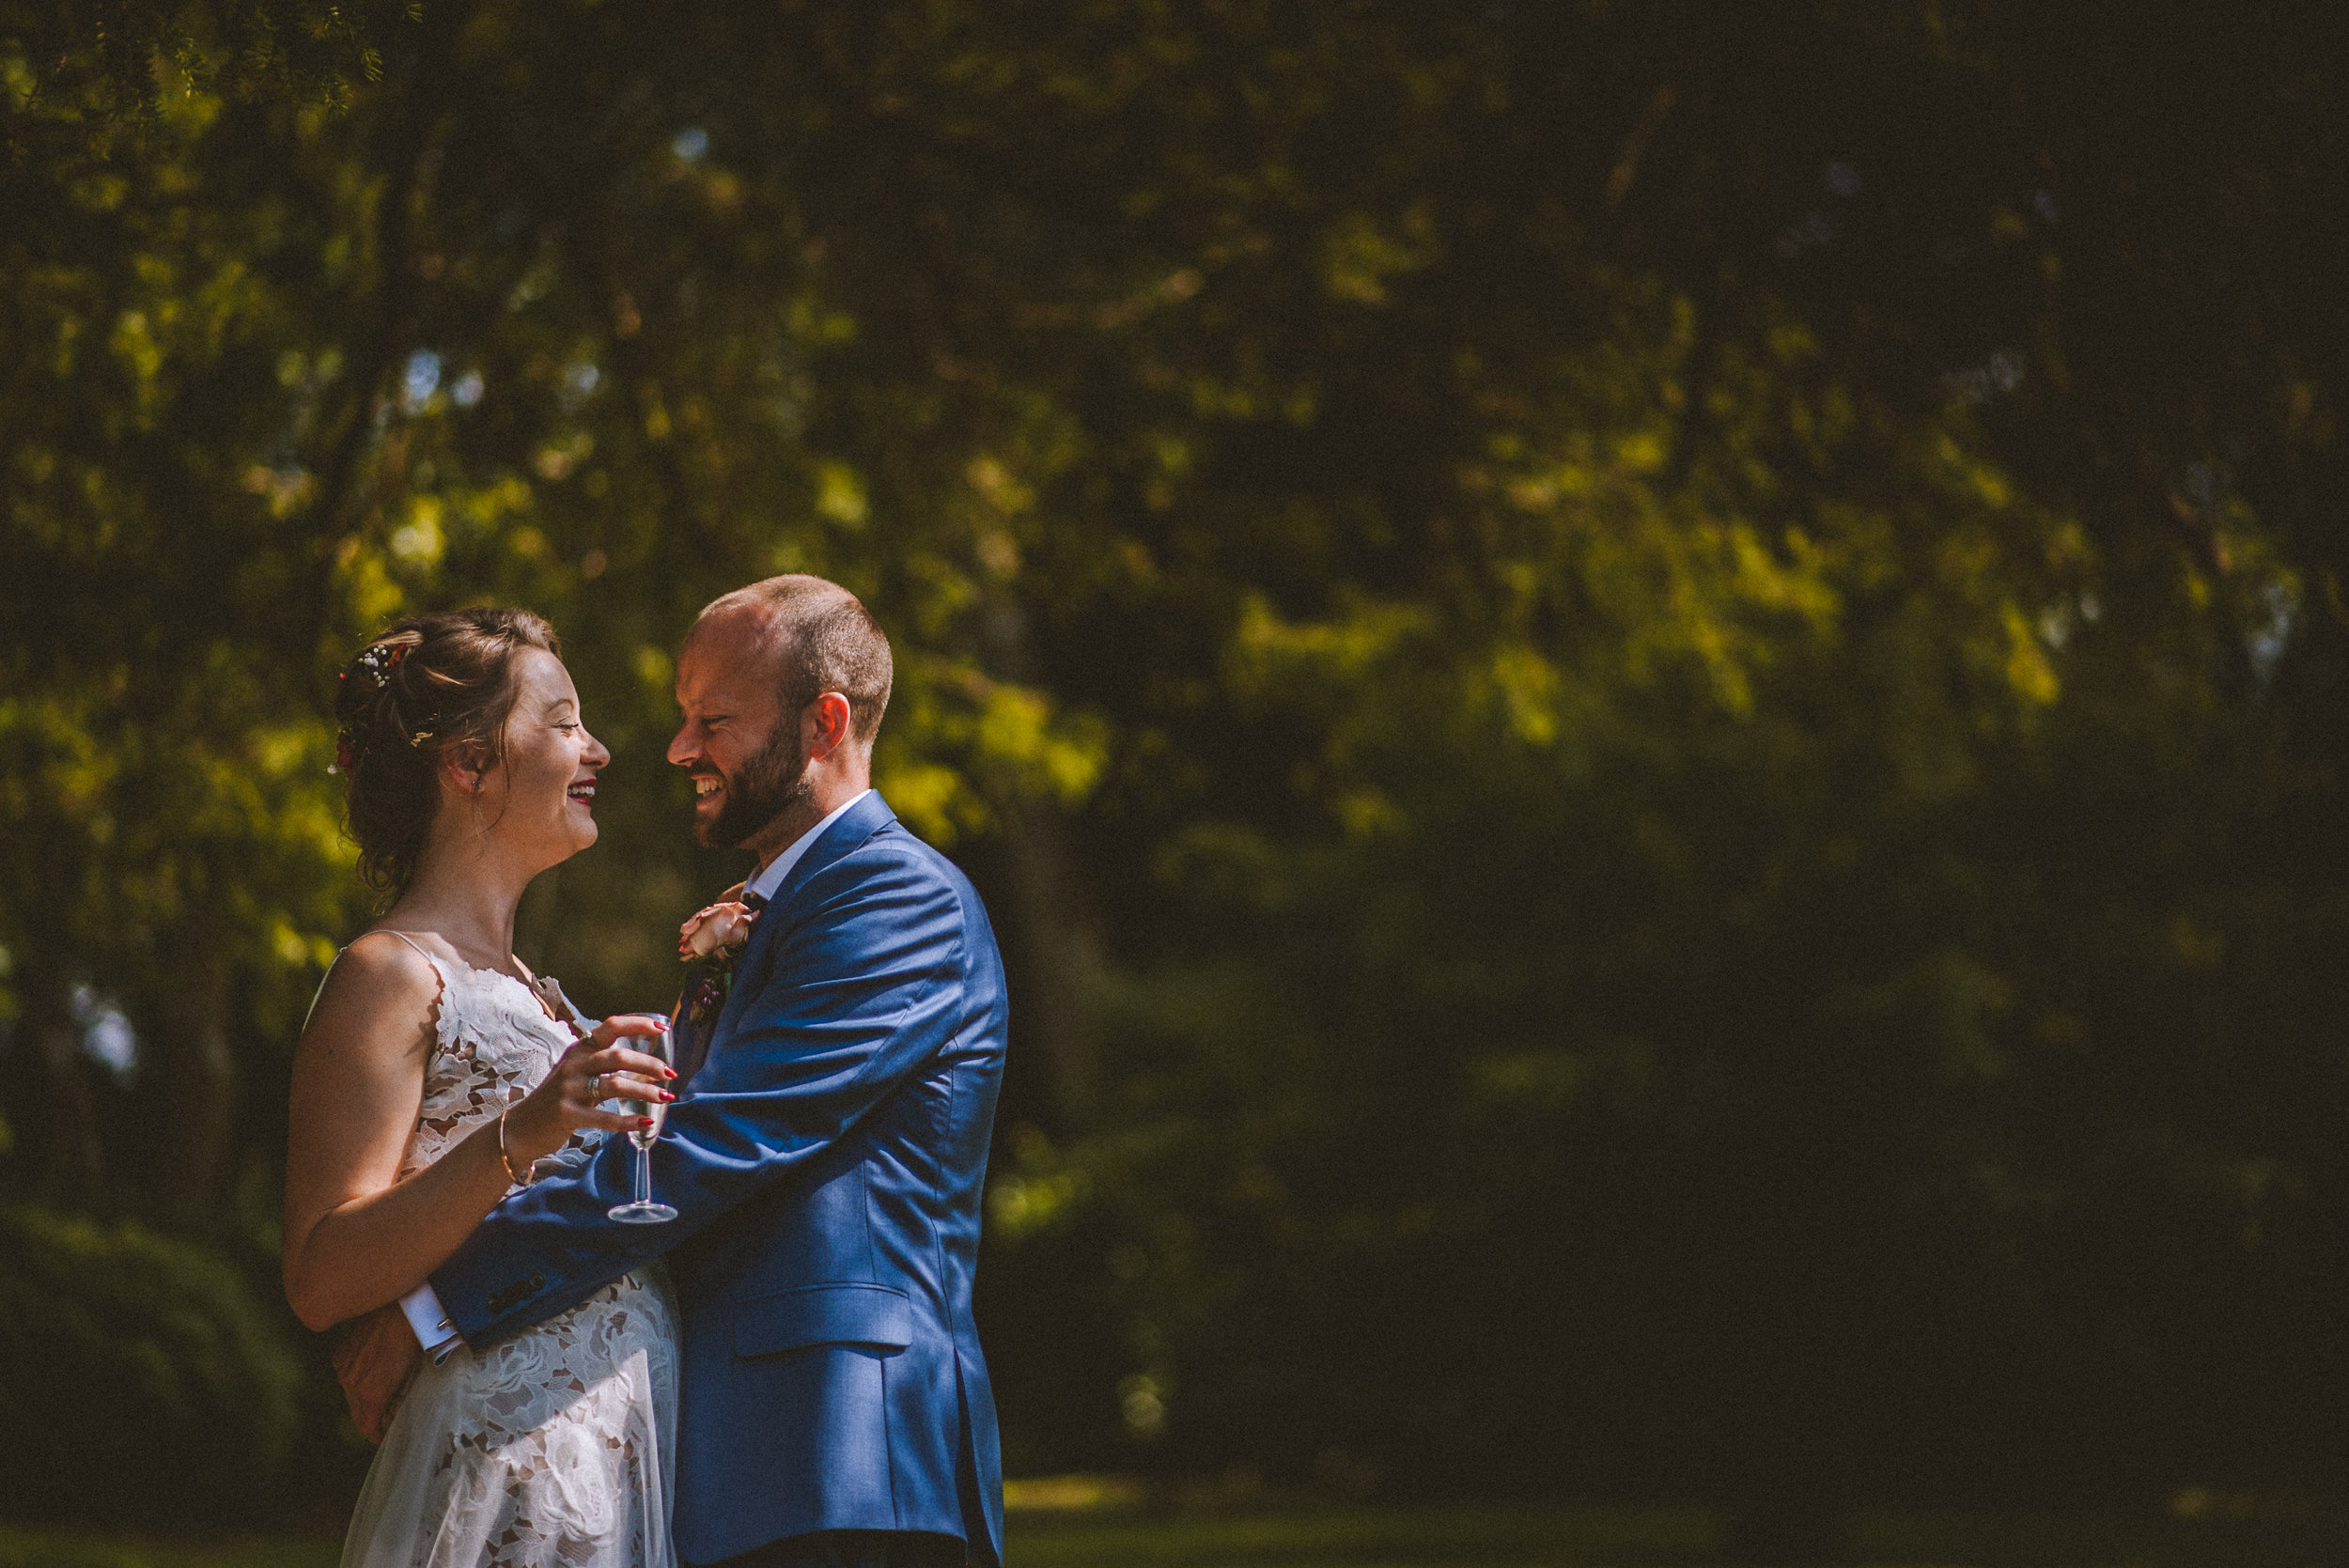 pencarrow-house-wedding-photographer-80.jpg